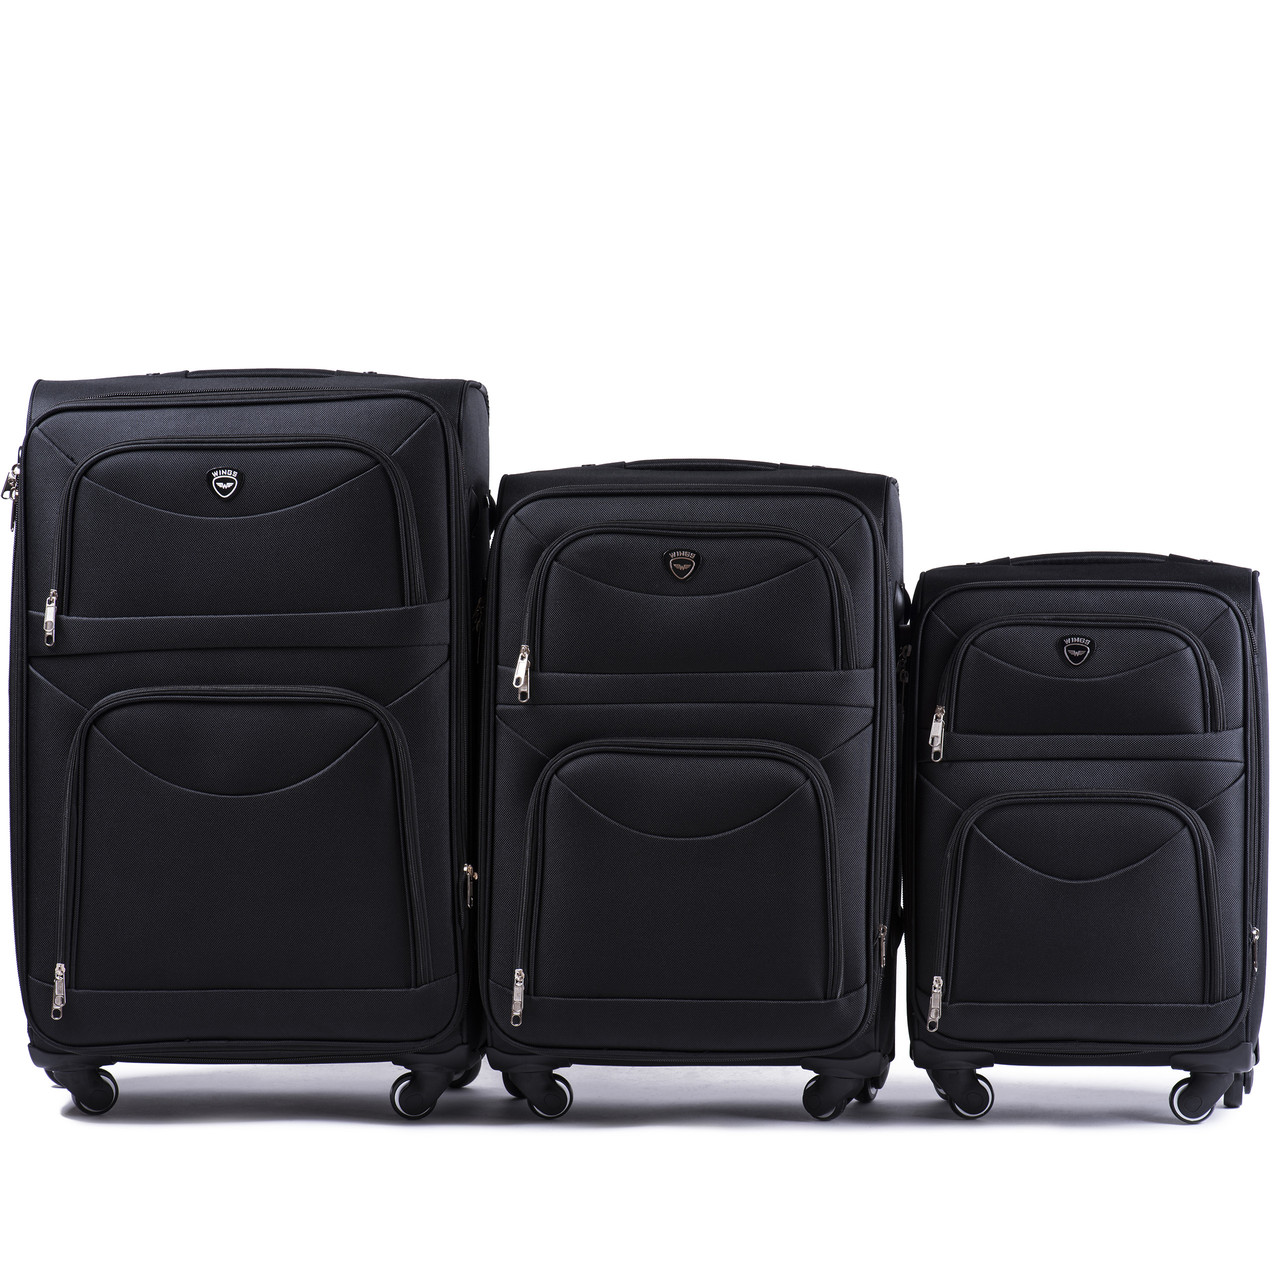 Комплект тканевых чемоданов Wings 6802-4 на 4 колесах, фото 1